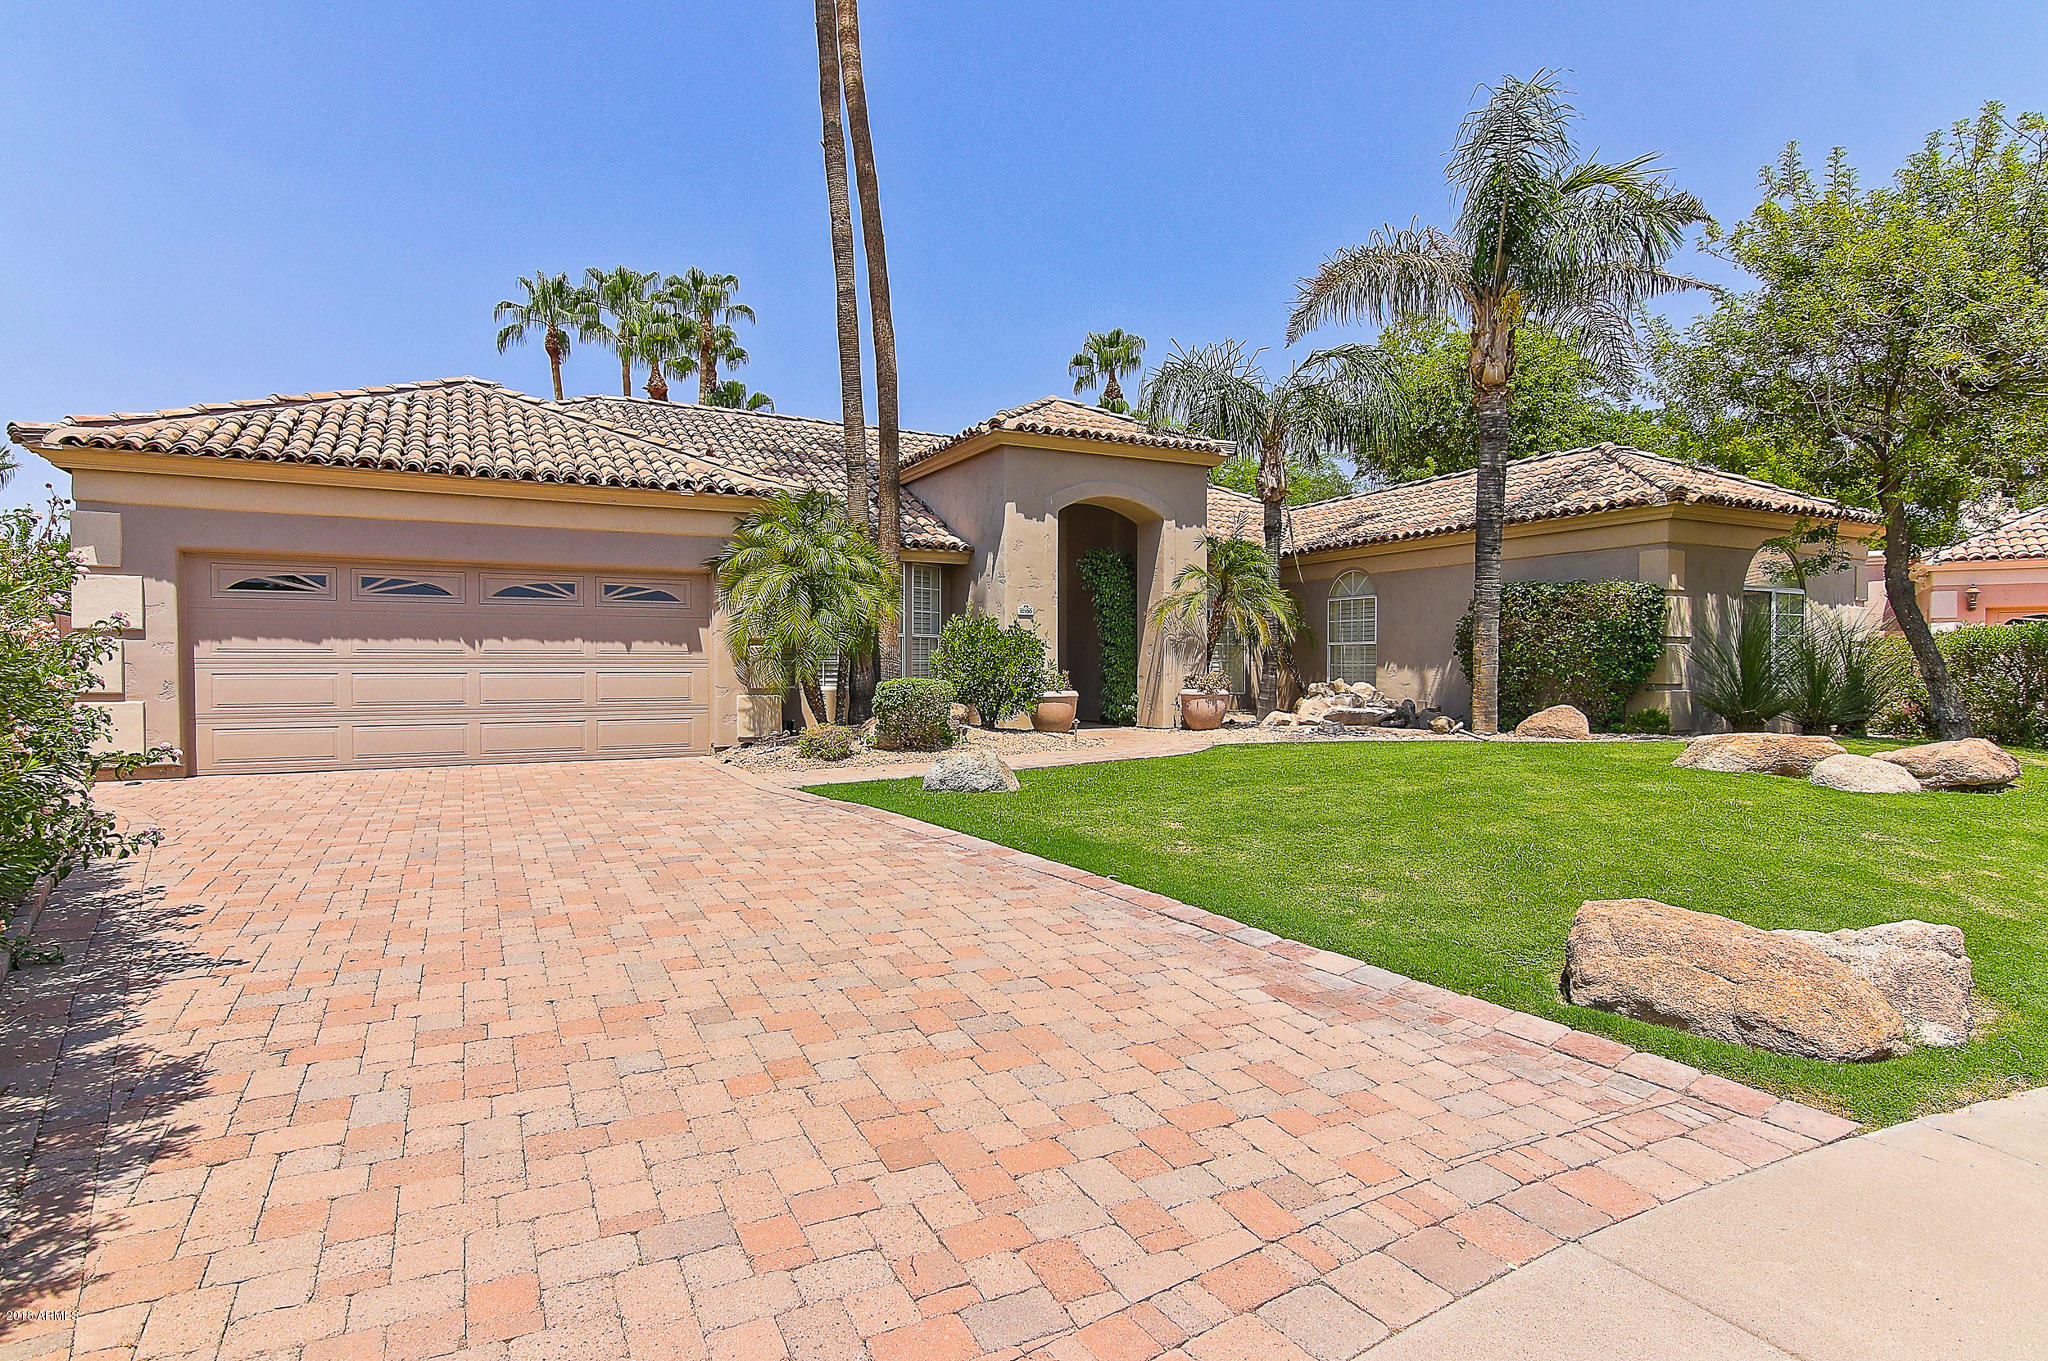 10100 E CARON Street, Scottsdale, AZ 85258, 3 Bedrooms Bedrooms, ,Residential Lease,For Rent,10100 E CARON Street,6261168